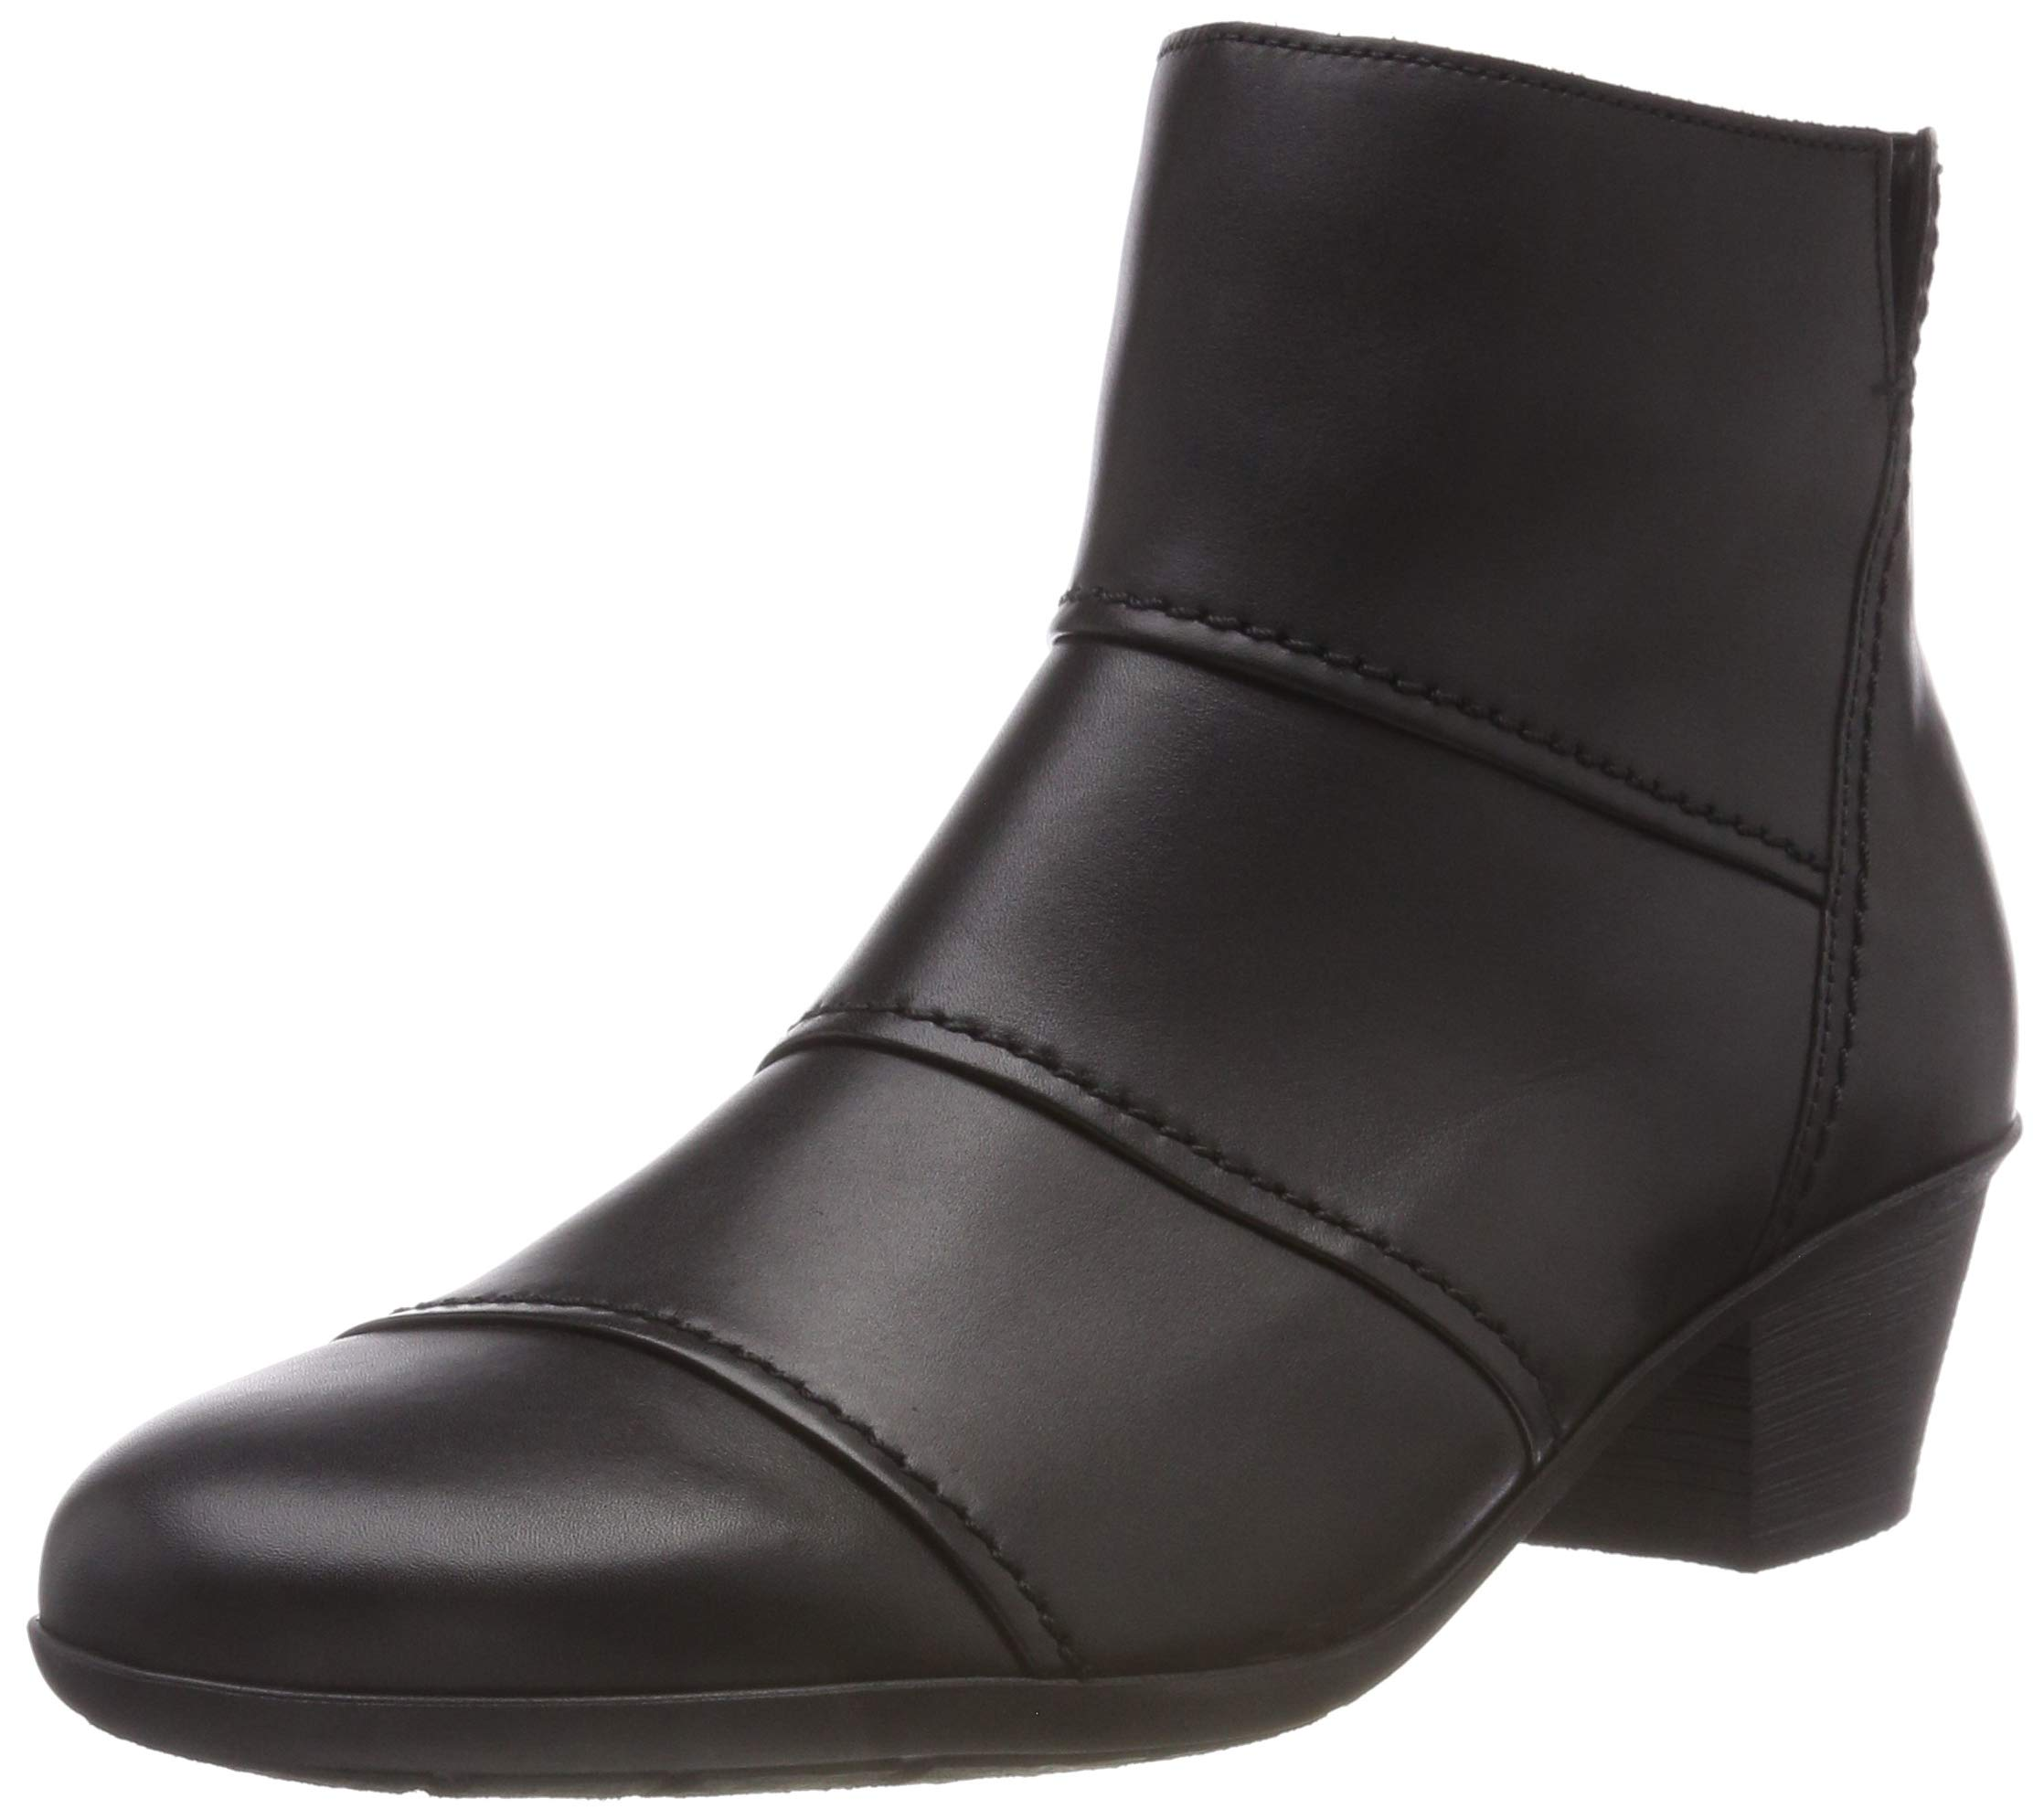 CasualBotines Shoes Eu FemmeNoirschwarz Gabor 2744 wPuTkZOXil